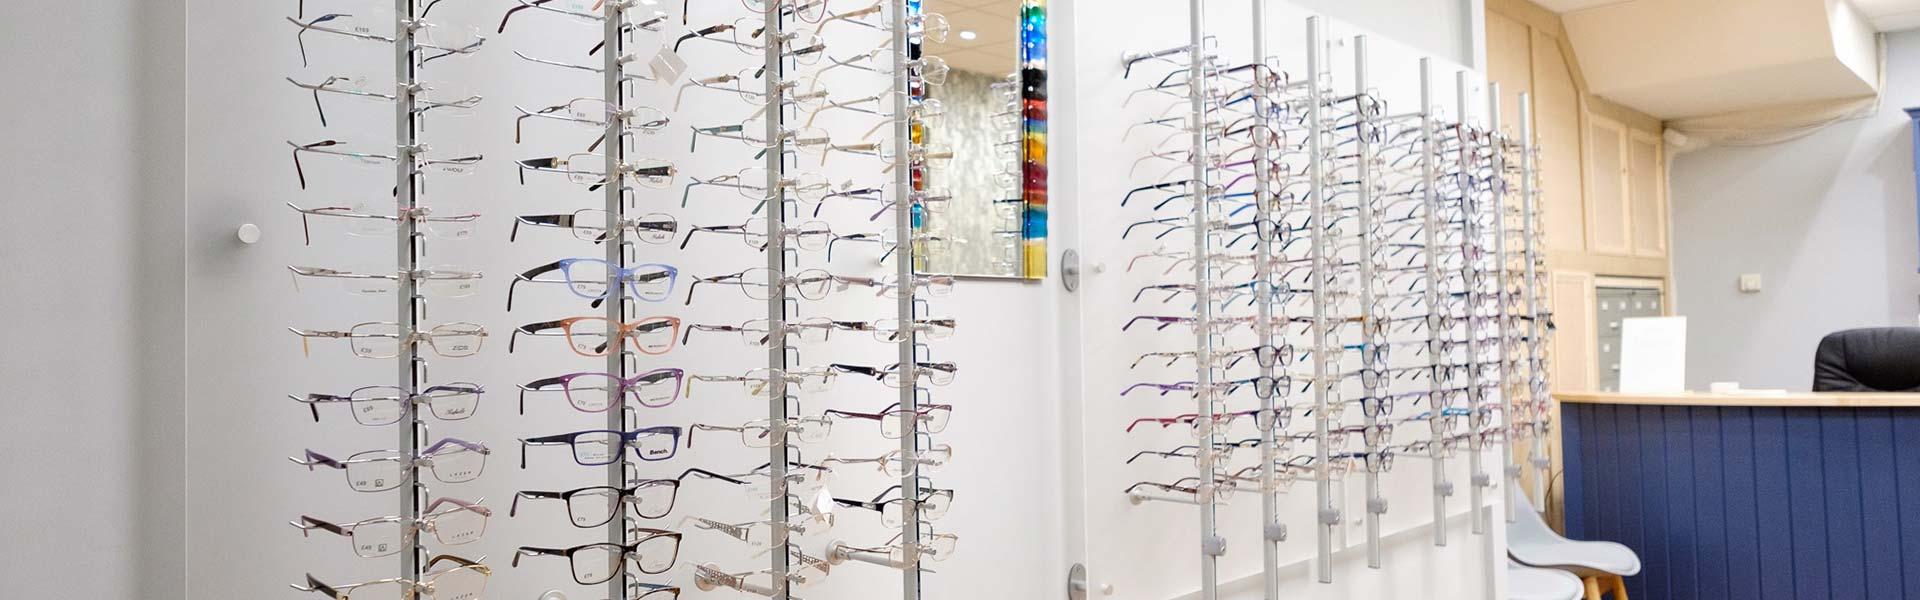 Independent Optician Established 1988 Chris Adams Opticians